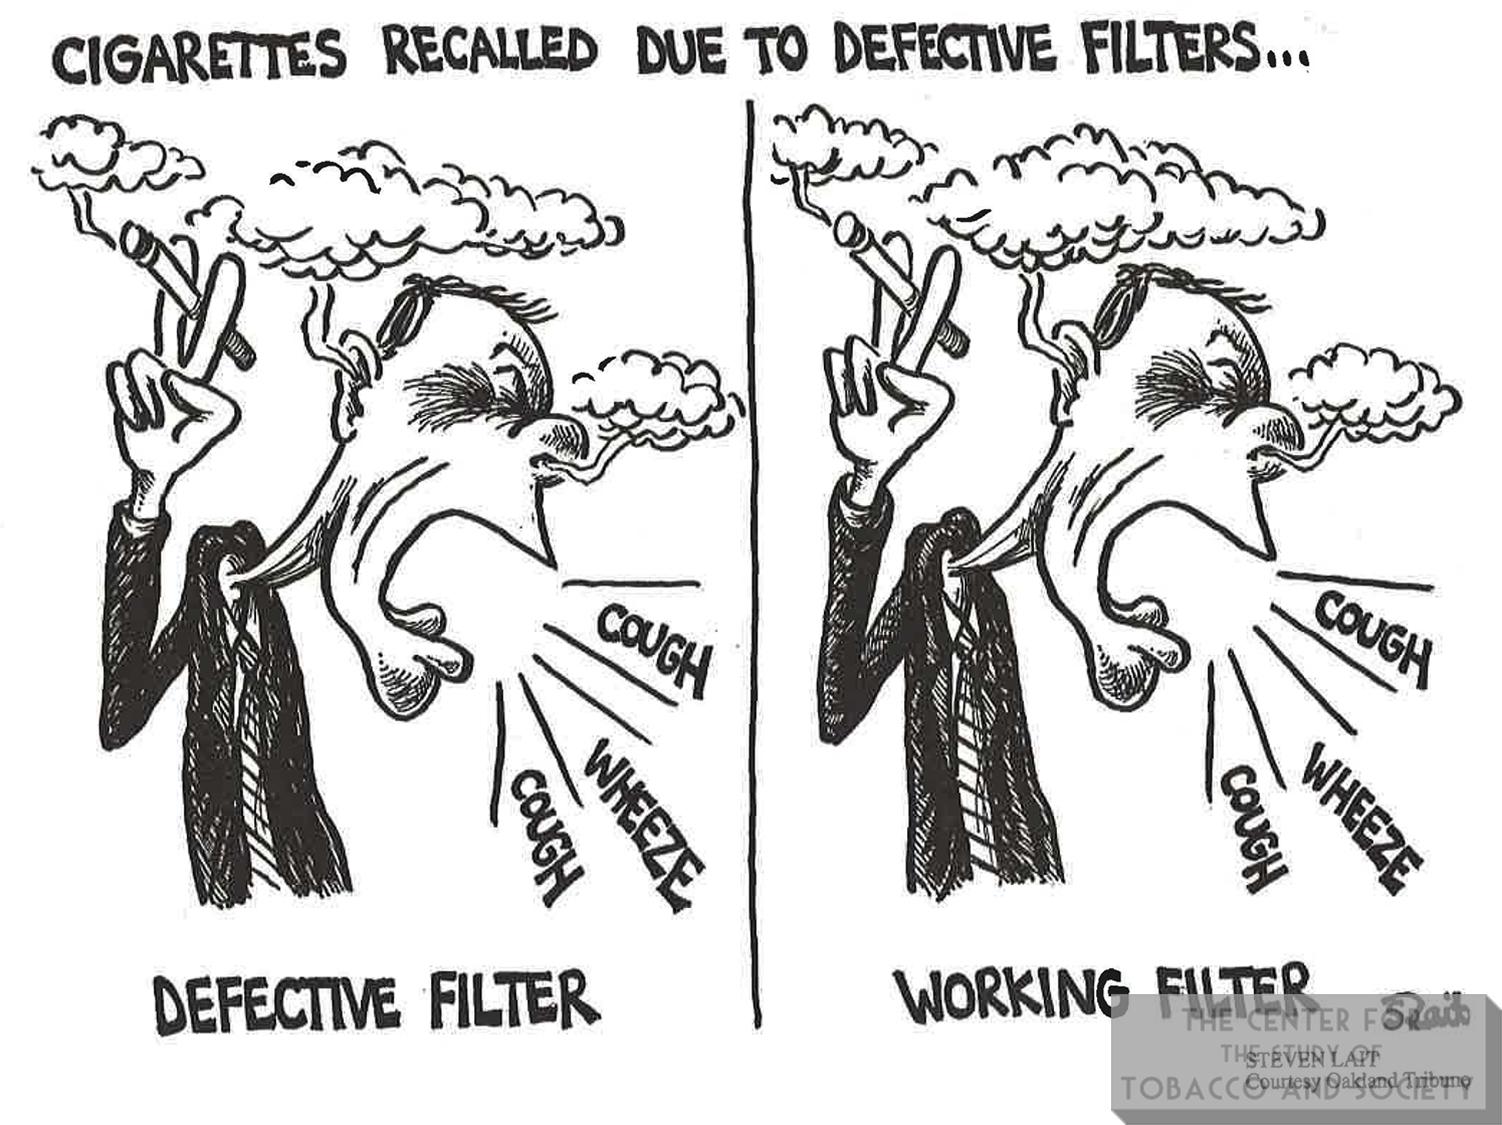 1996 Steven Lait Cigarettes Recalled Due to Defective Filters